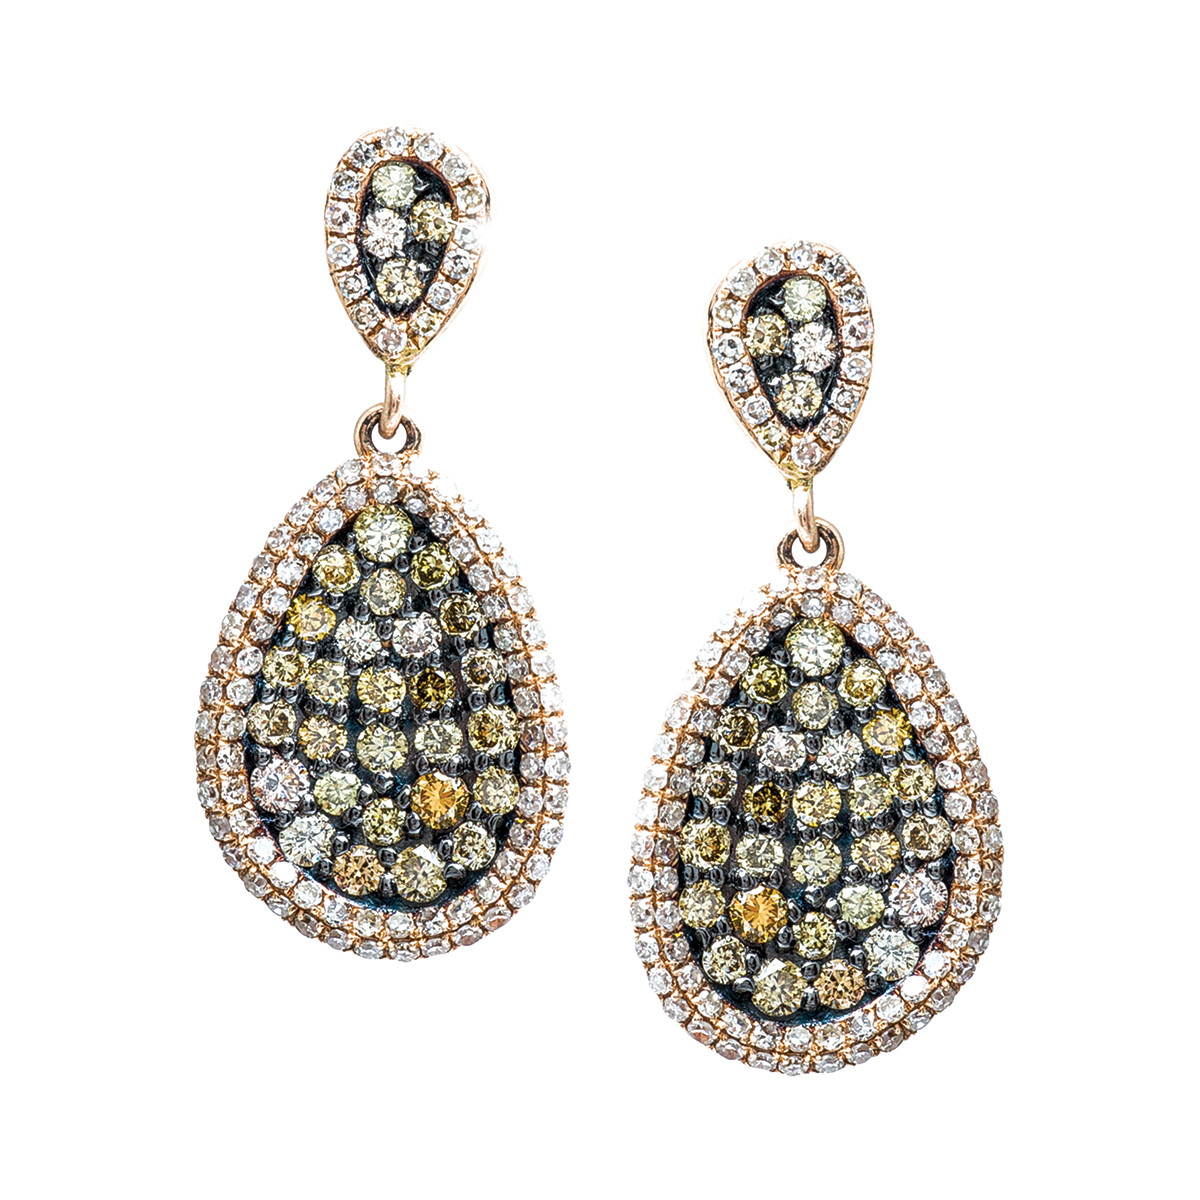 New Madison L 1.52 CTW White & Yellow-Brown Diamond Earrings